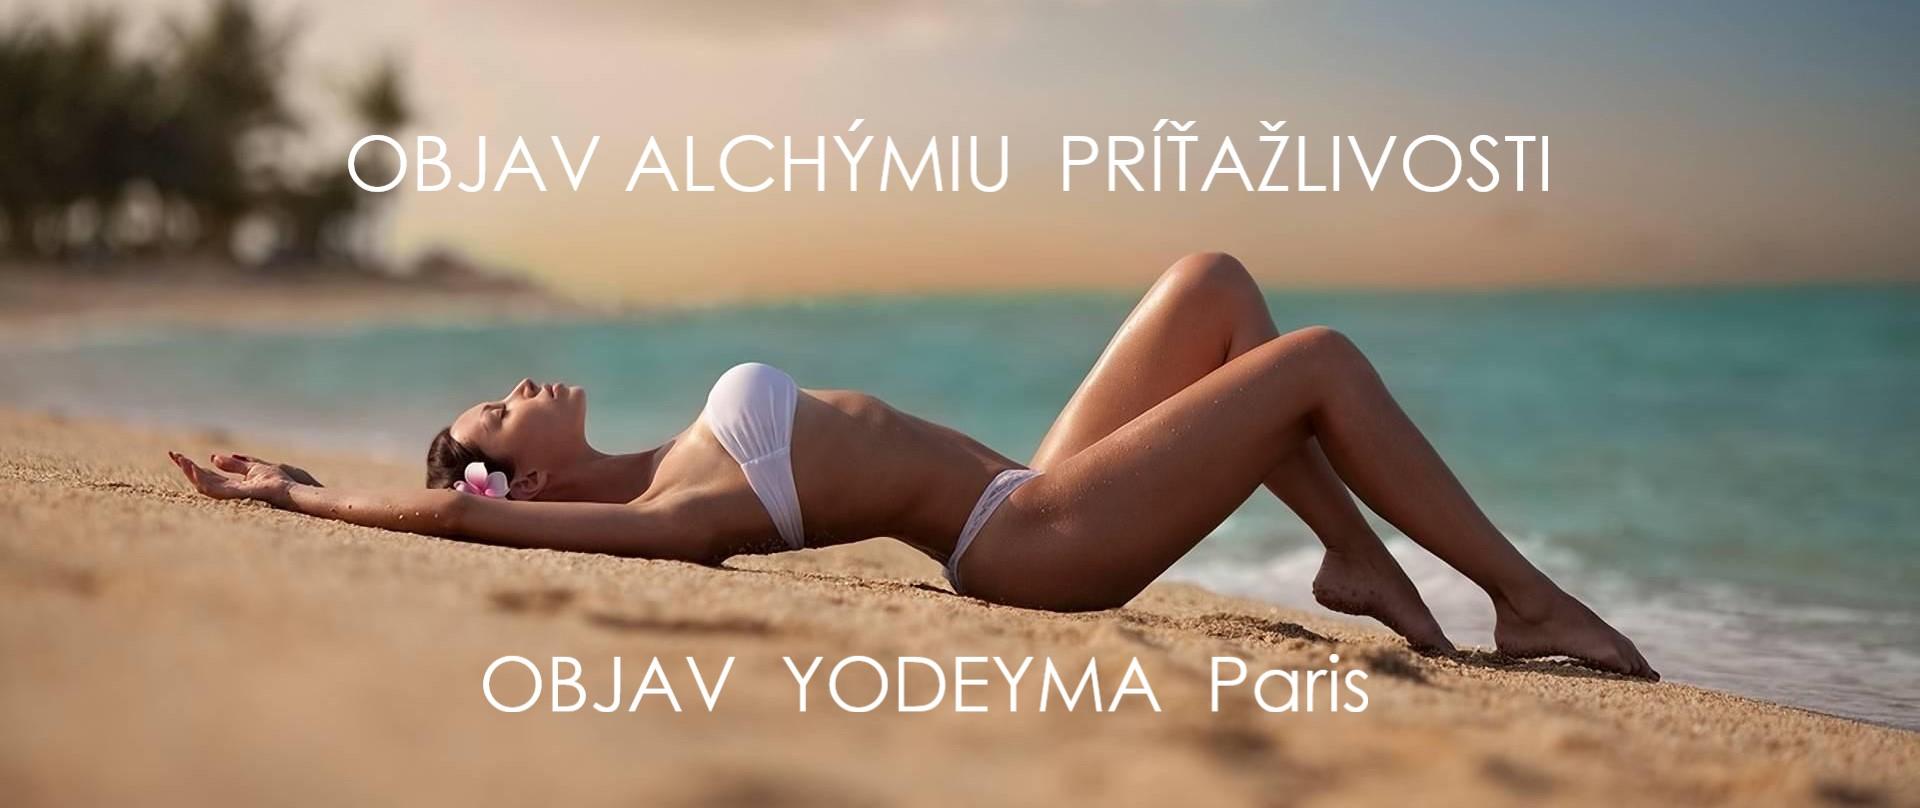 Parfémy Yodeyma Paris